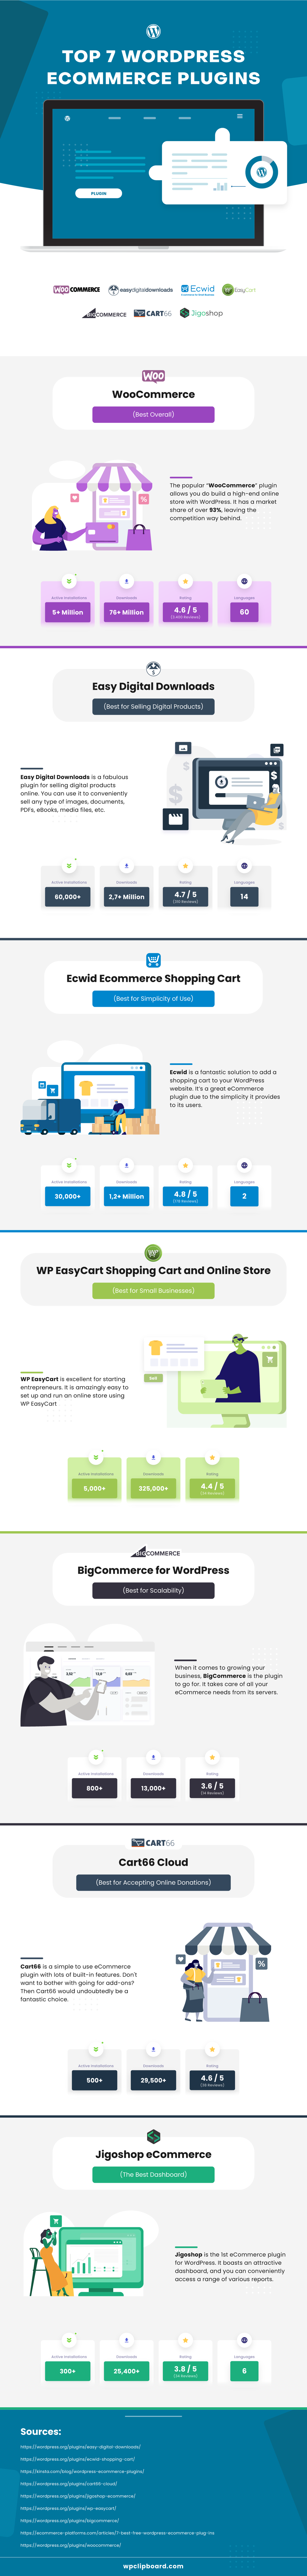 Top 7 wordress ecommerce plugins